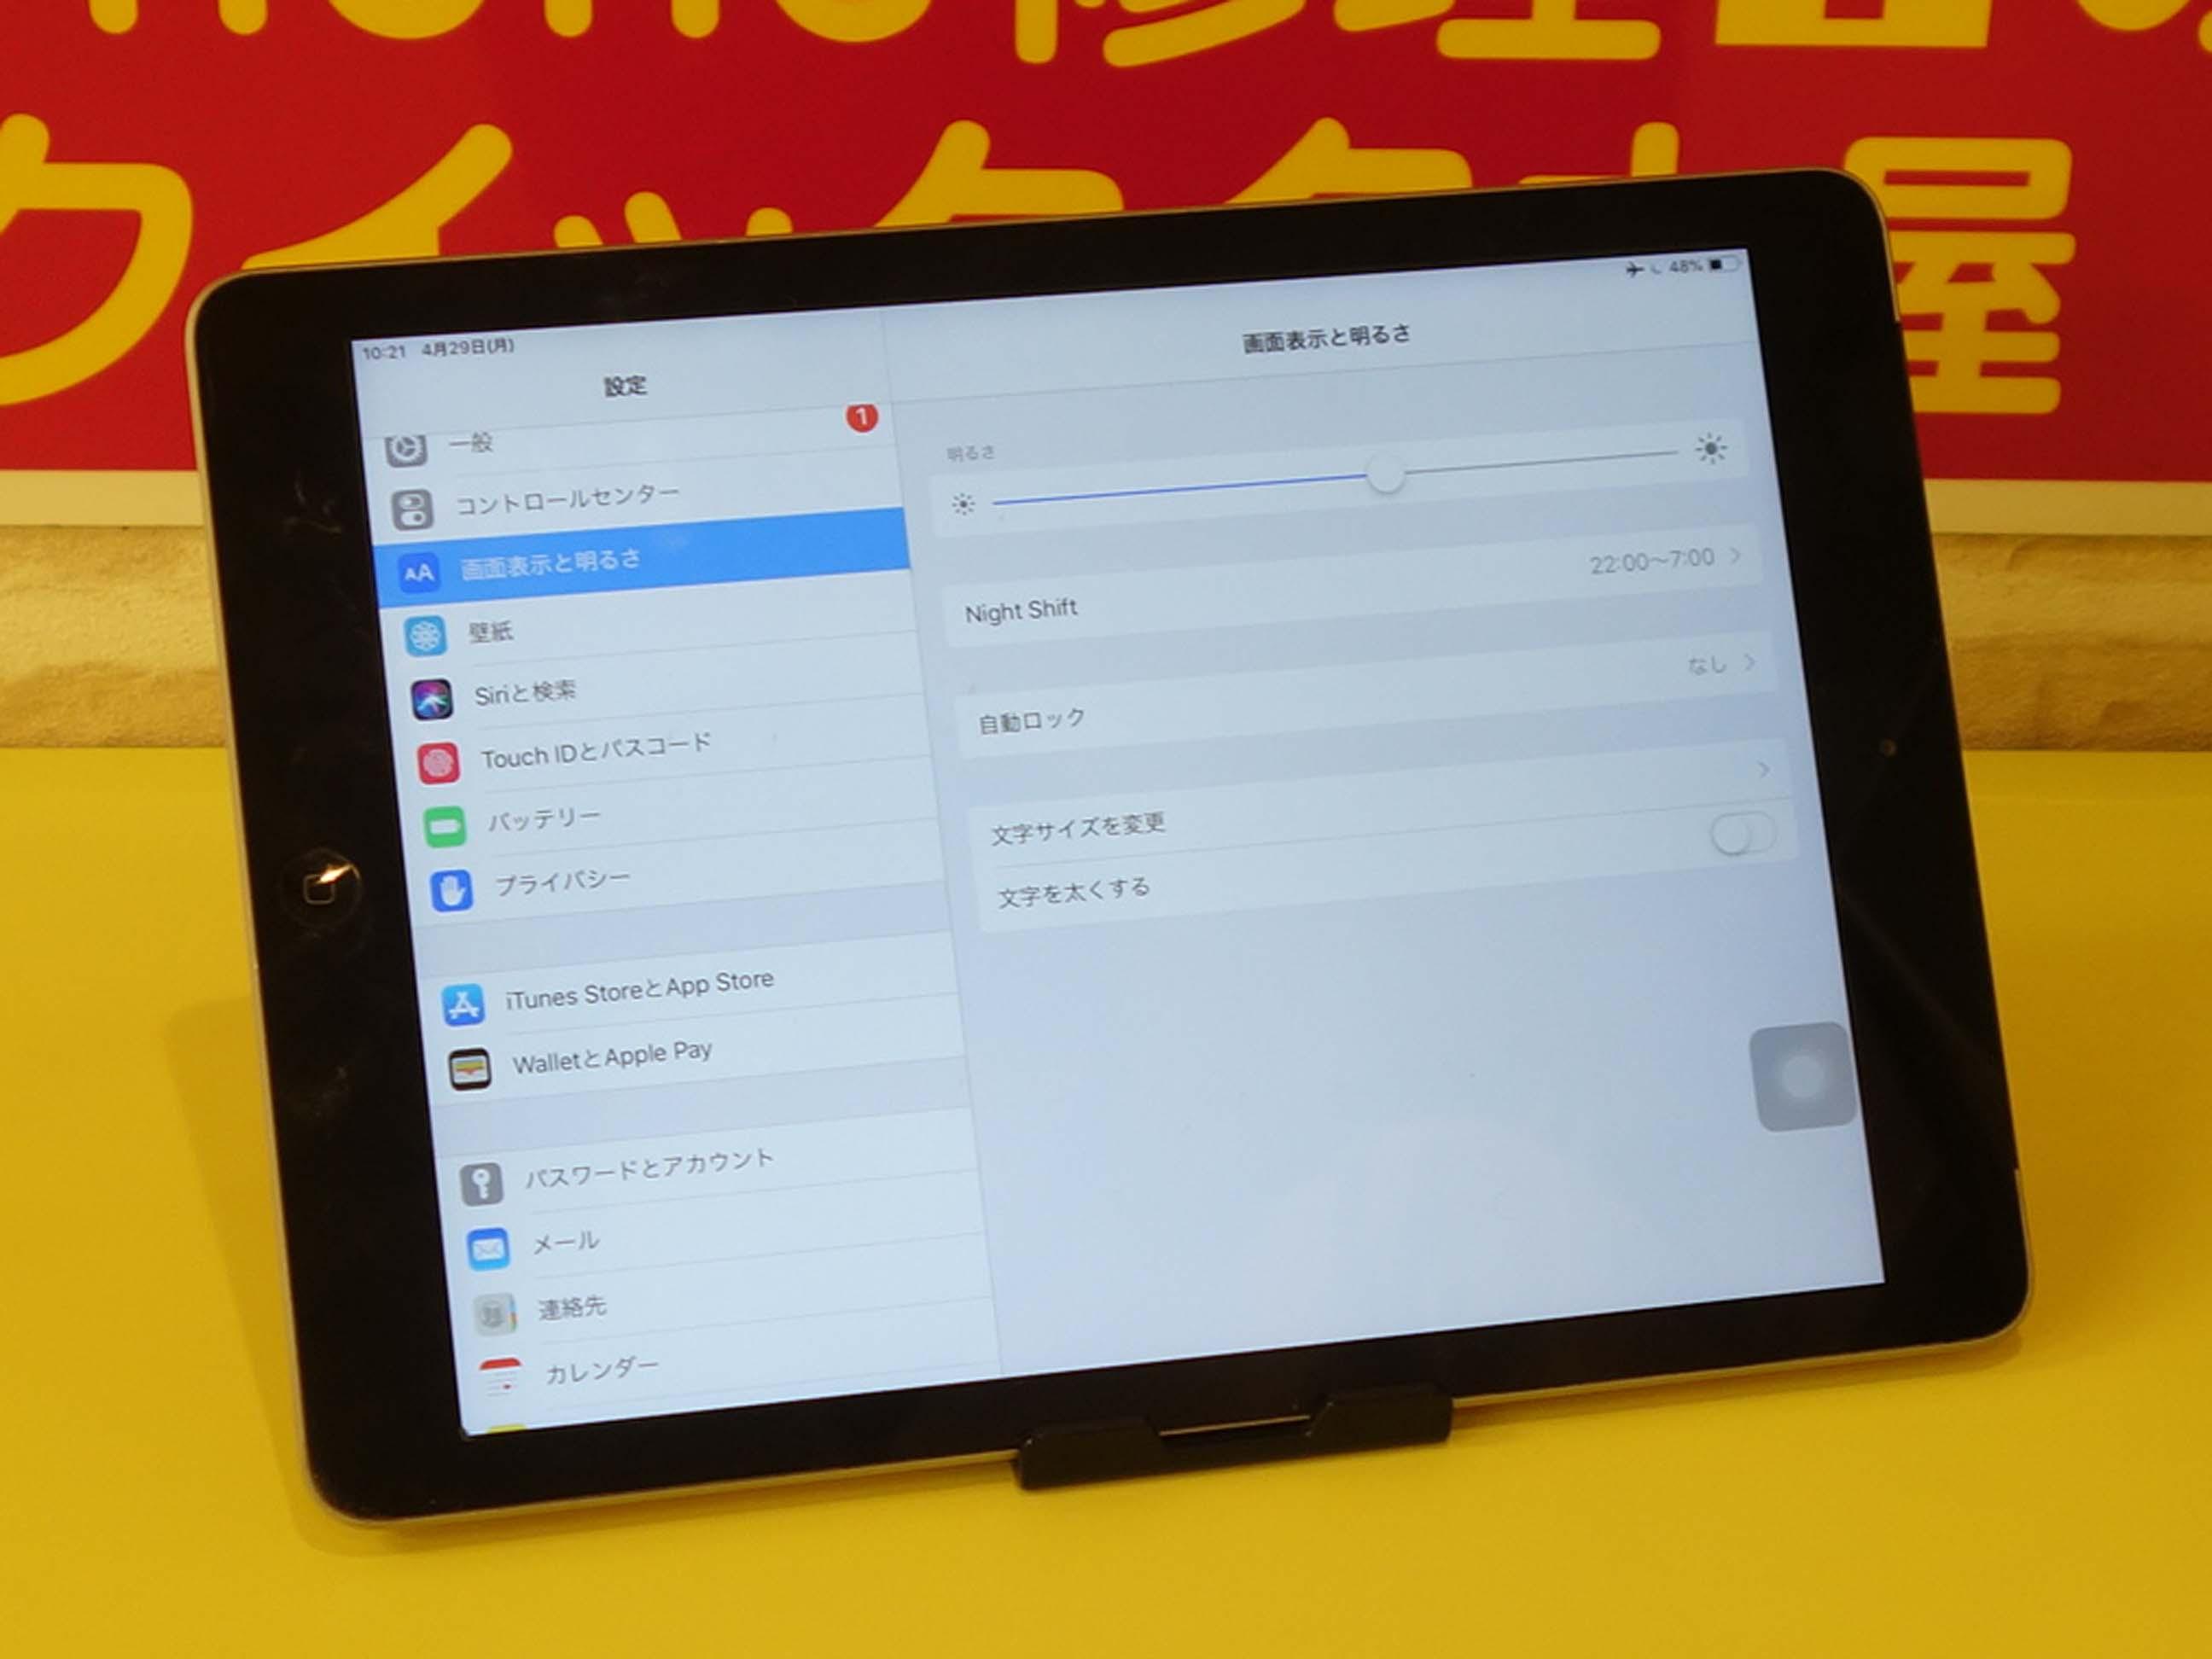 iPad5のホームボタン修理で豊田市からご来店!アイパッド修理のクイック名古屋